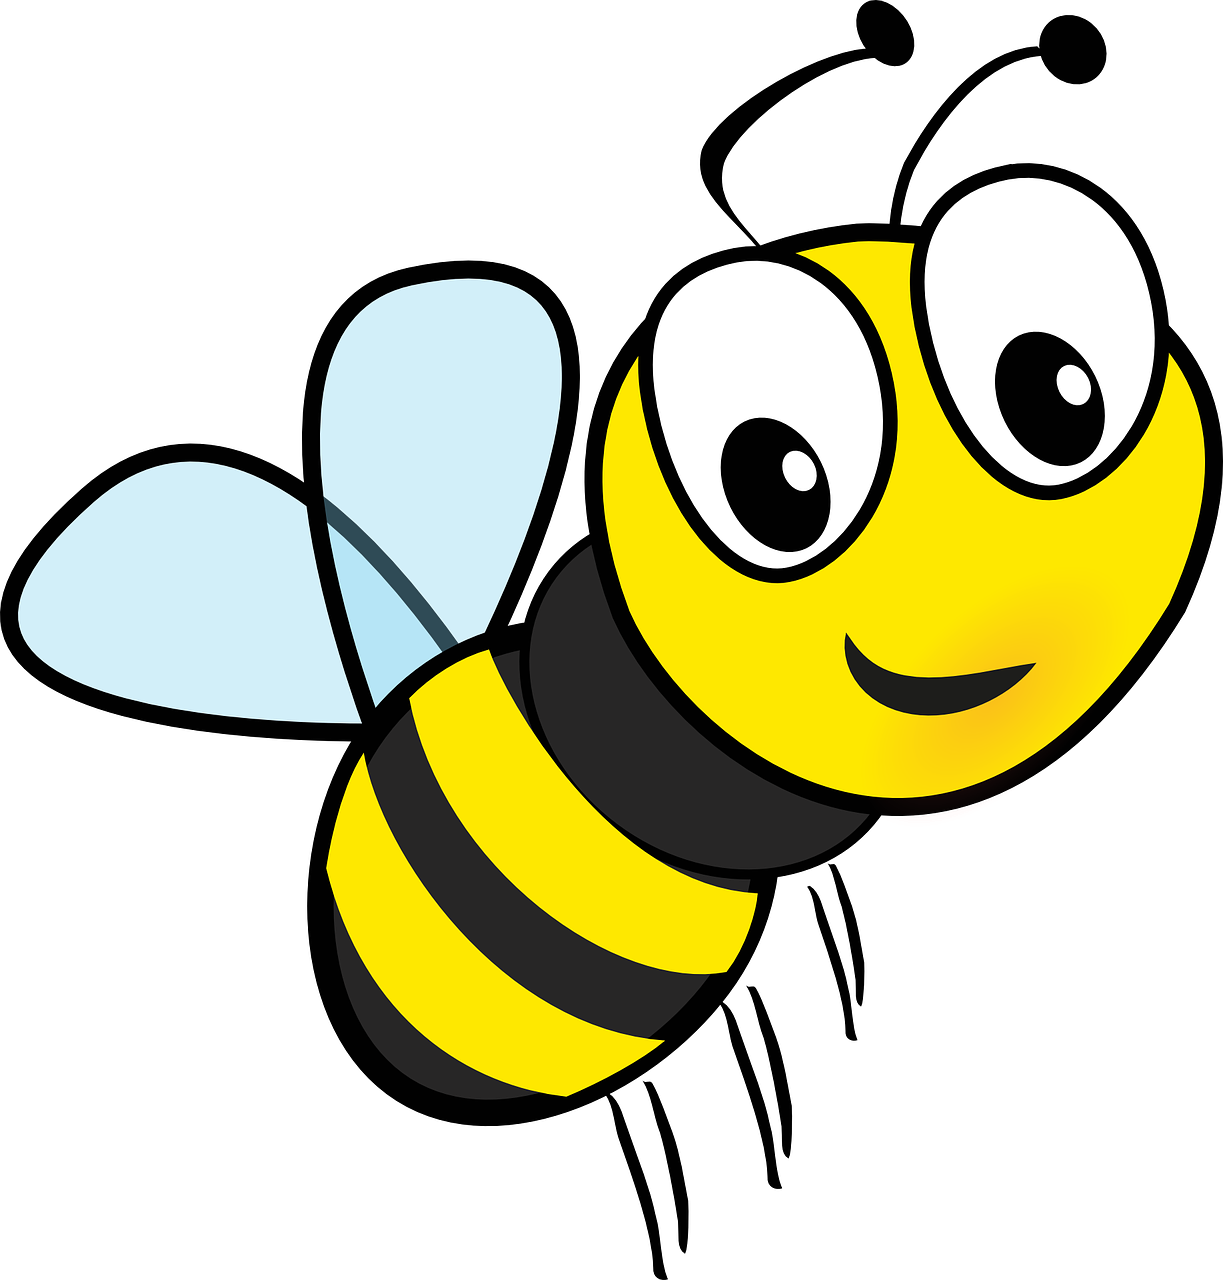 clip art freeuse download cartoon bee